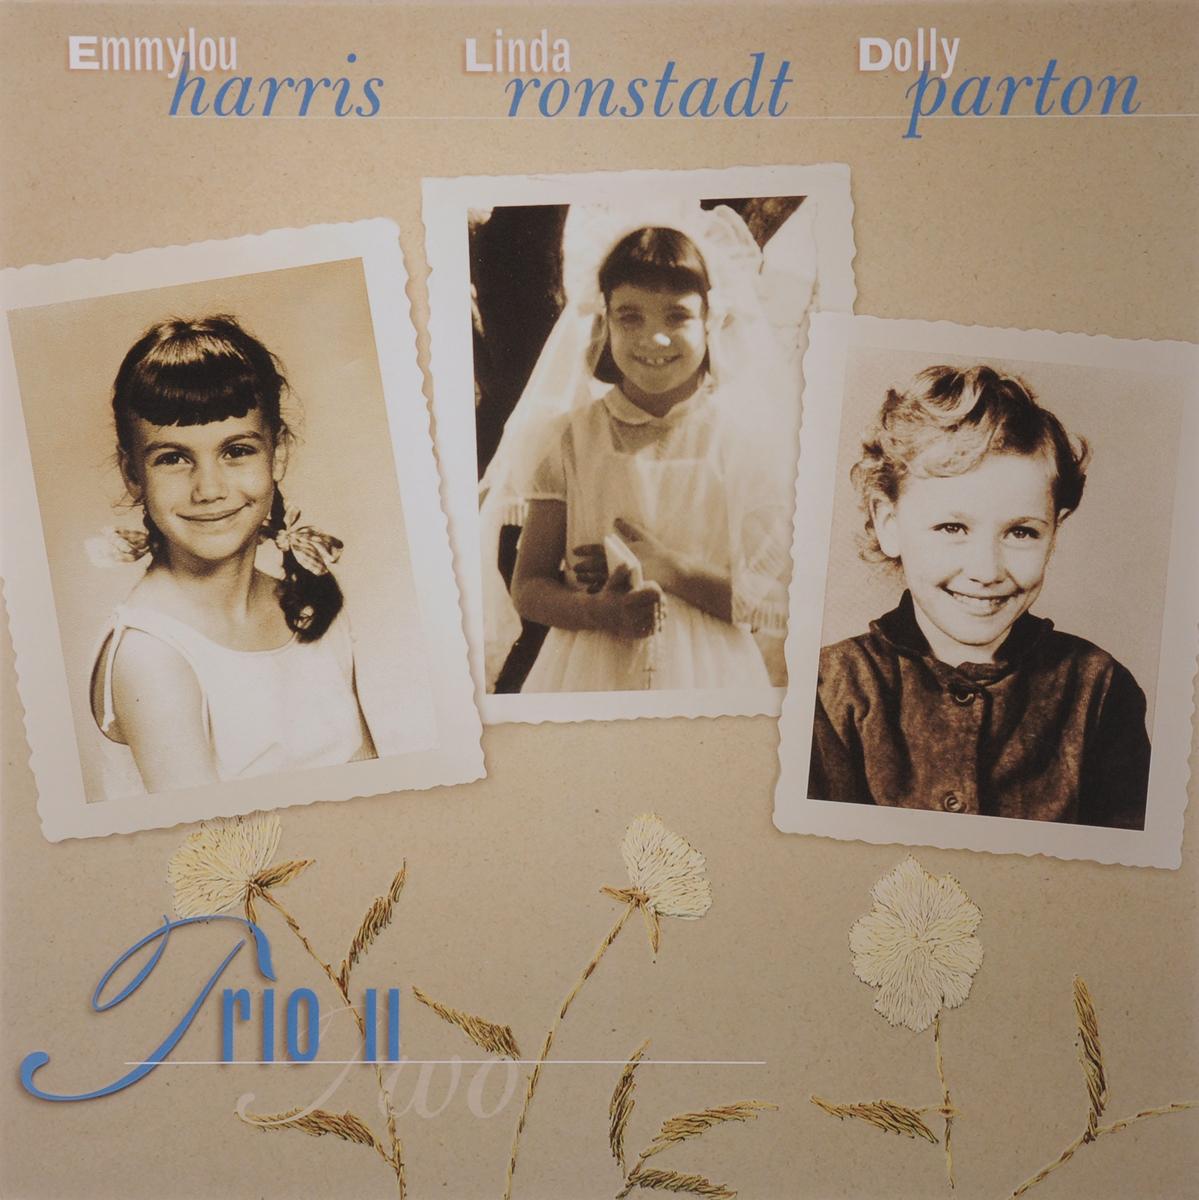 Эммилу Харрис,Линда Ронстадт,Долли Партон Emmylou Harris, Linda Ronstadt, Dolly Parton. Trio II (LP) долли партон линда ронстадт эммилу харрис dolly parton linda ronstadt emmylou harris trio